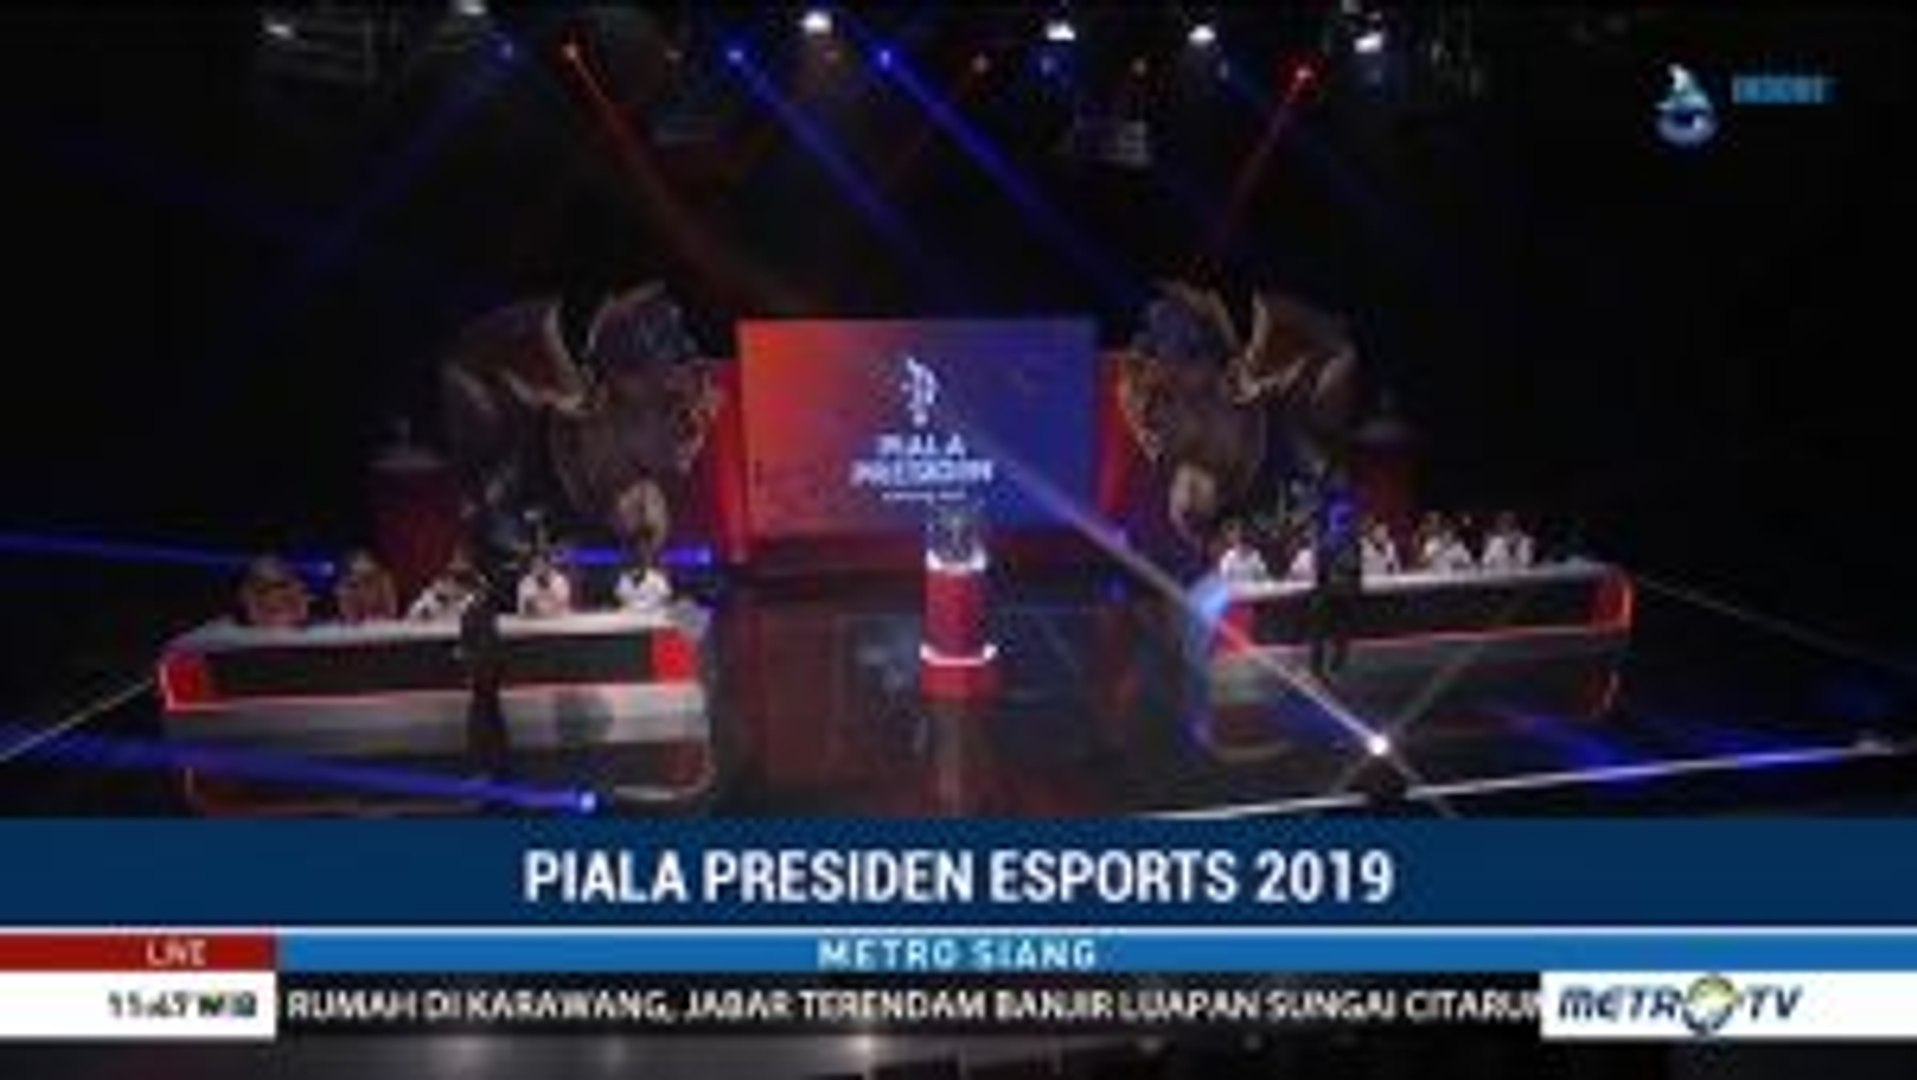 Final Kualifikasi Piala Presiden Esport Regional Pontianak Digelar Hari Ini